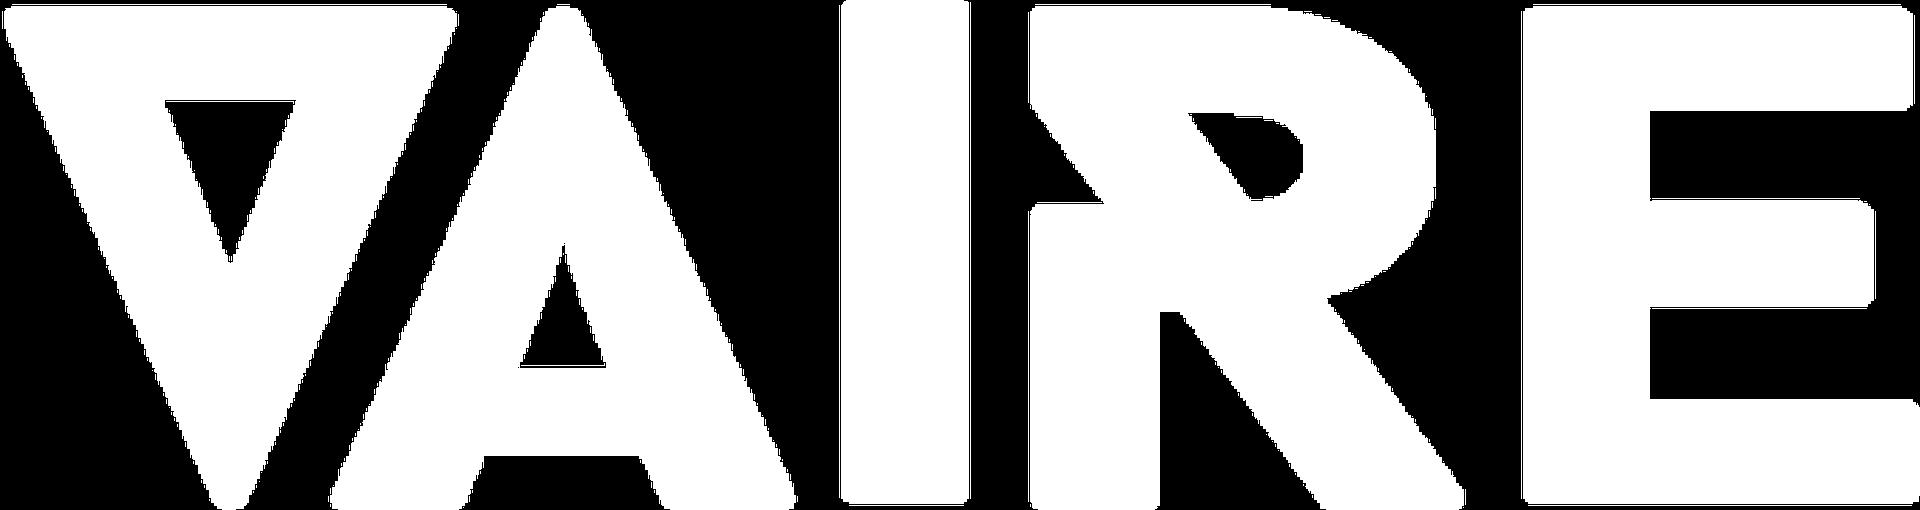 Vaire logo blanc